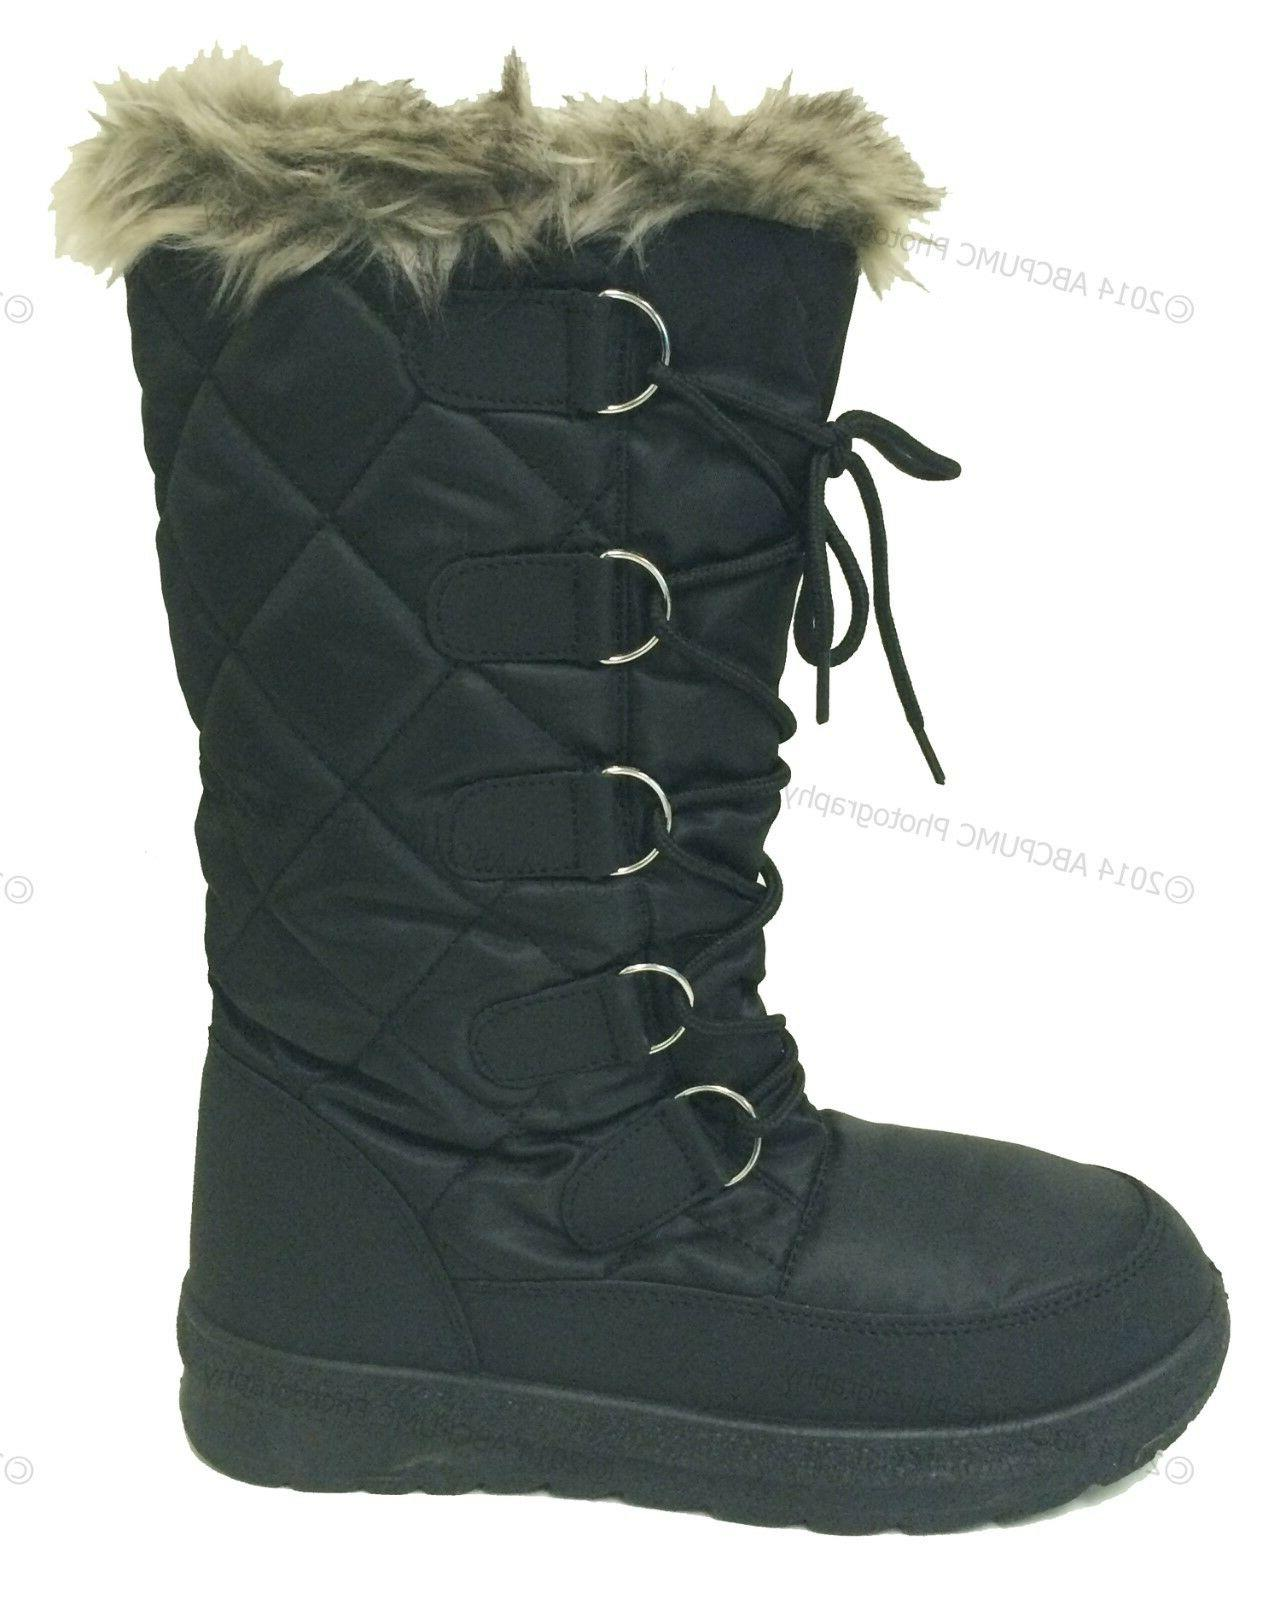 Brand New Boots Snow Fur Insulated Zipper Shoe